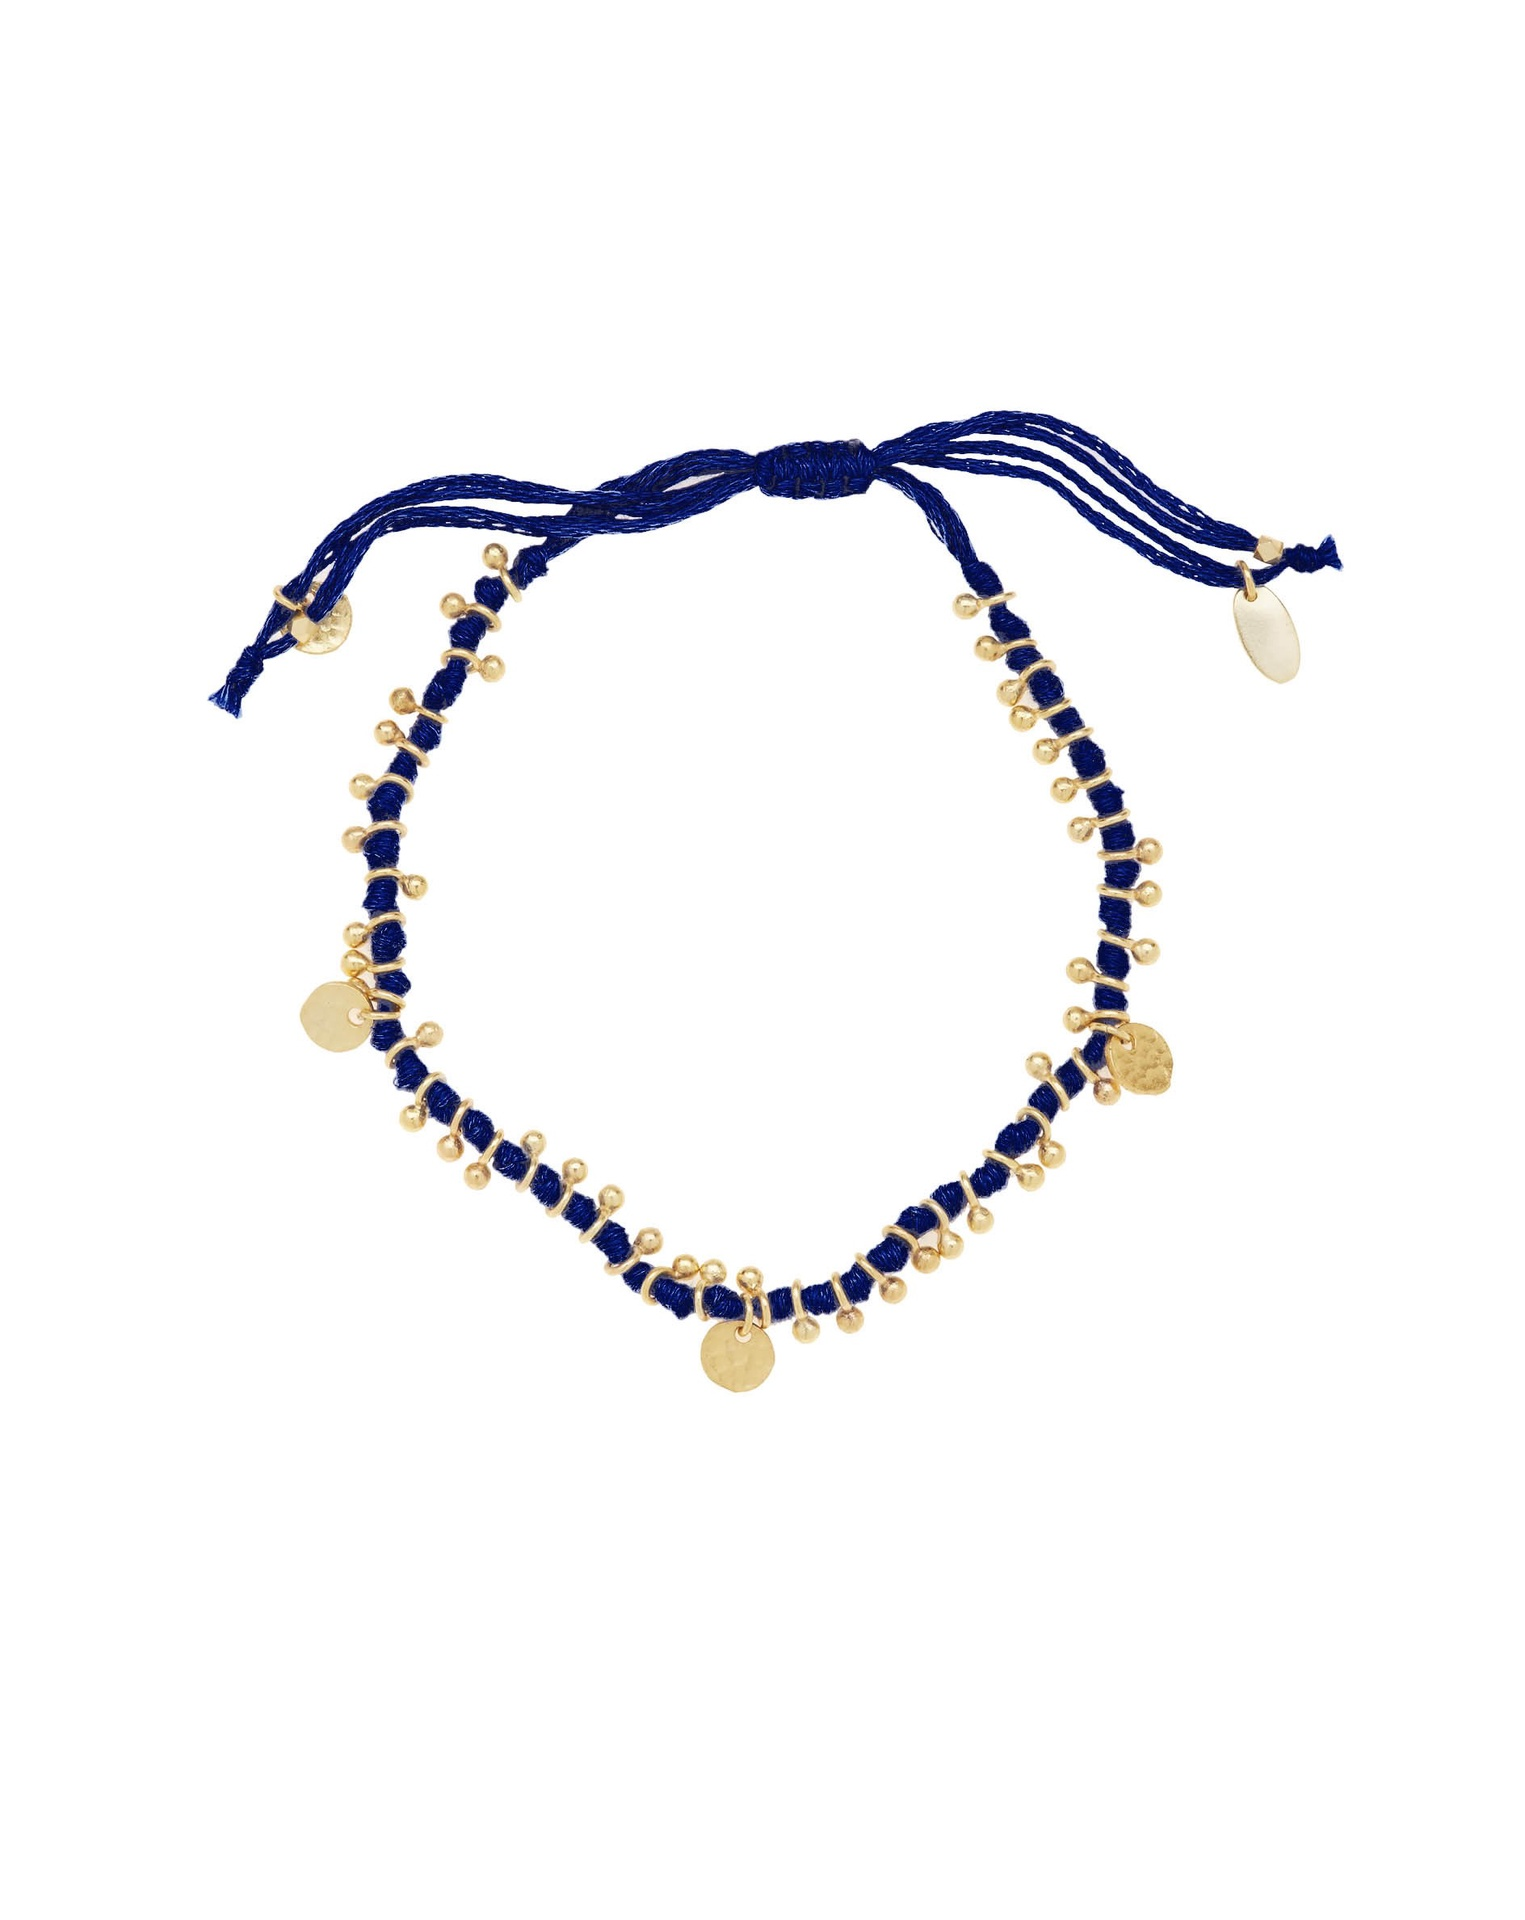 Gold plated adjustable cord bracelet by Ashiana London